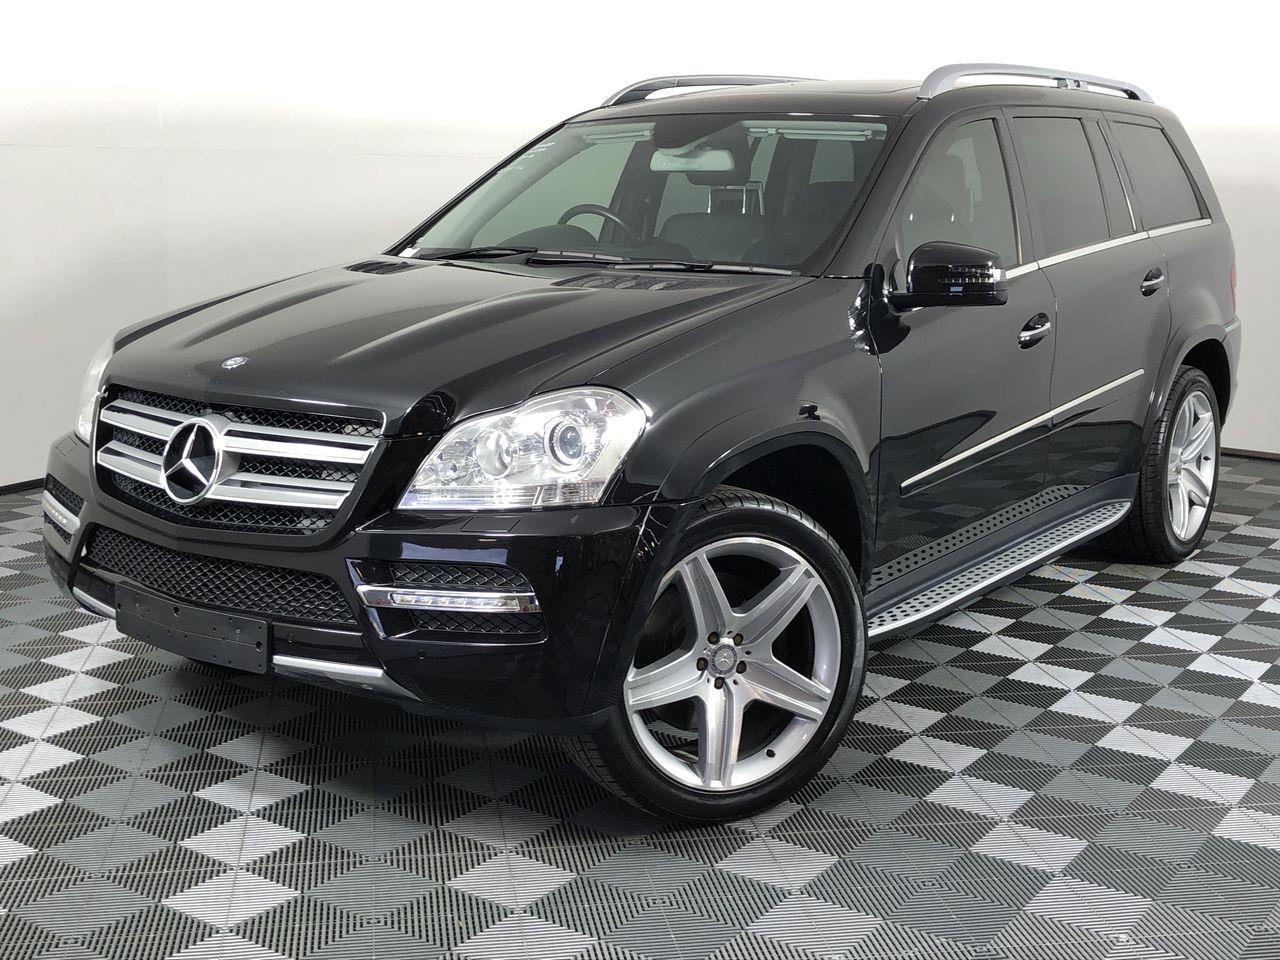 2012 Mercedes Benz GL350 CDI X164 Turbo Diesel Automatic 7 Seats Wagon